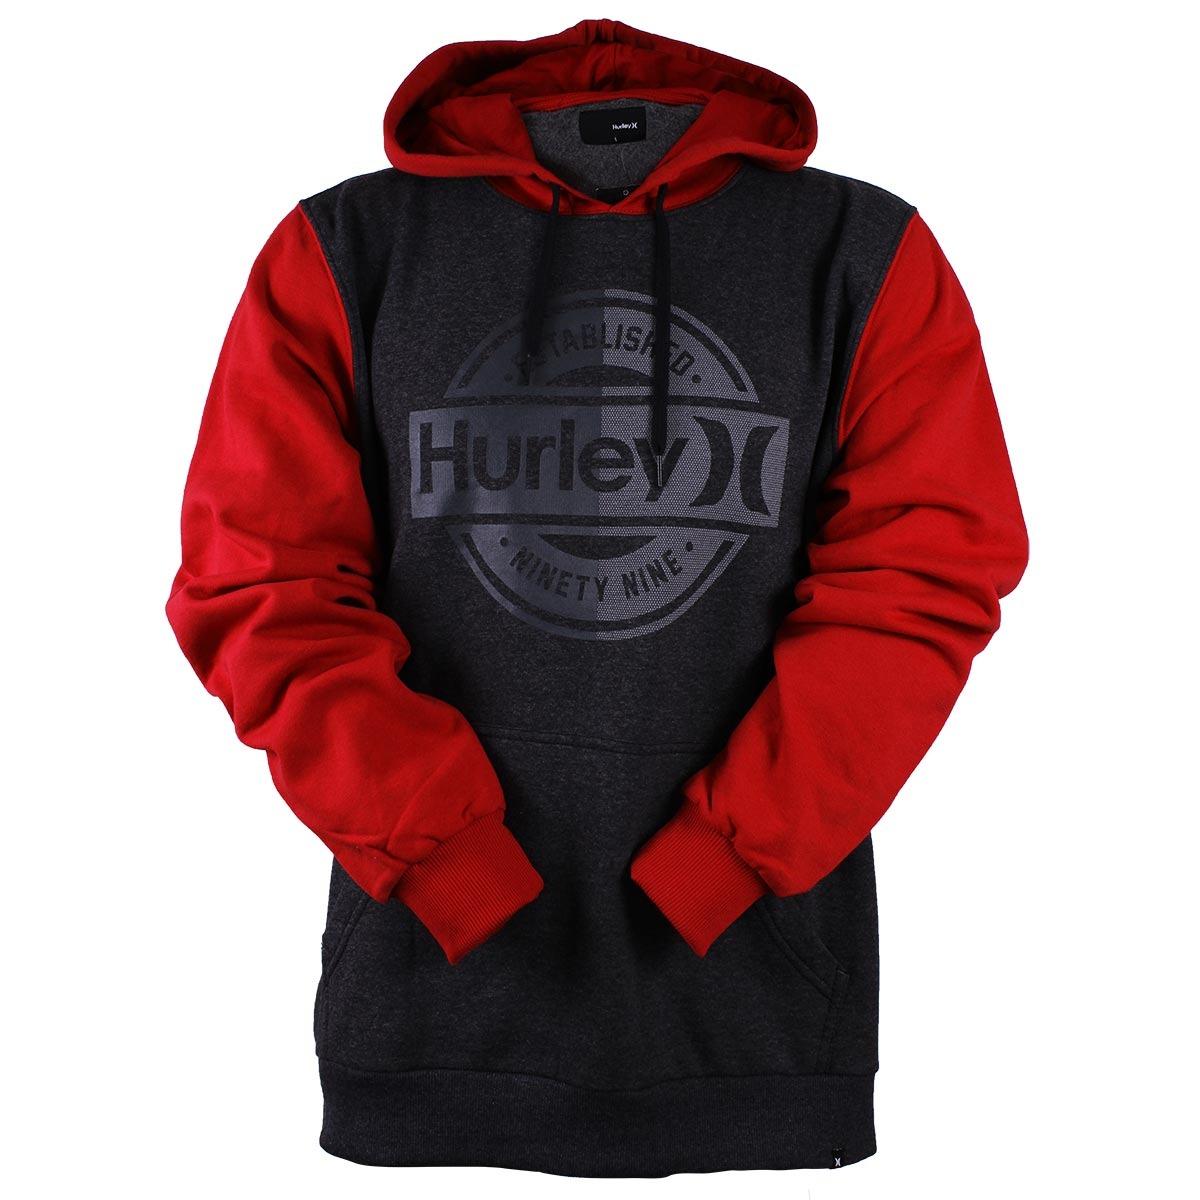 5ca359f717808 Moletom Hurley Ninety Nine Cinza vermelho-gg - R  199